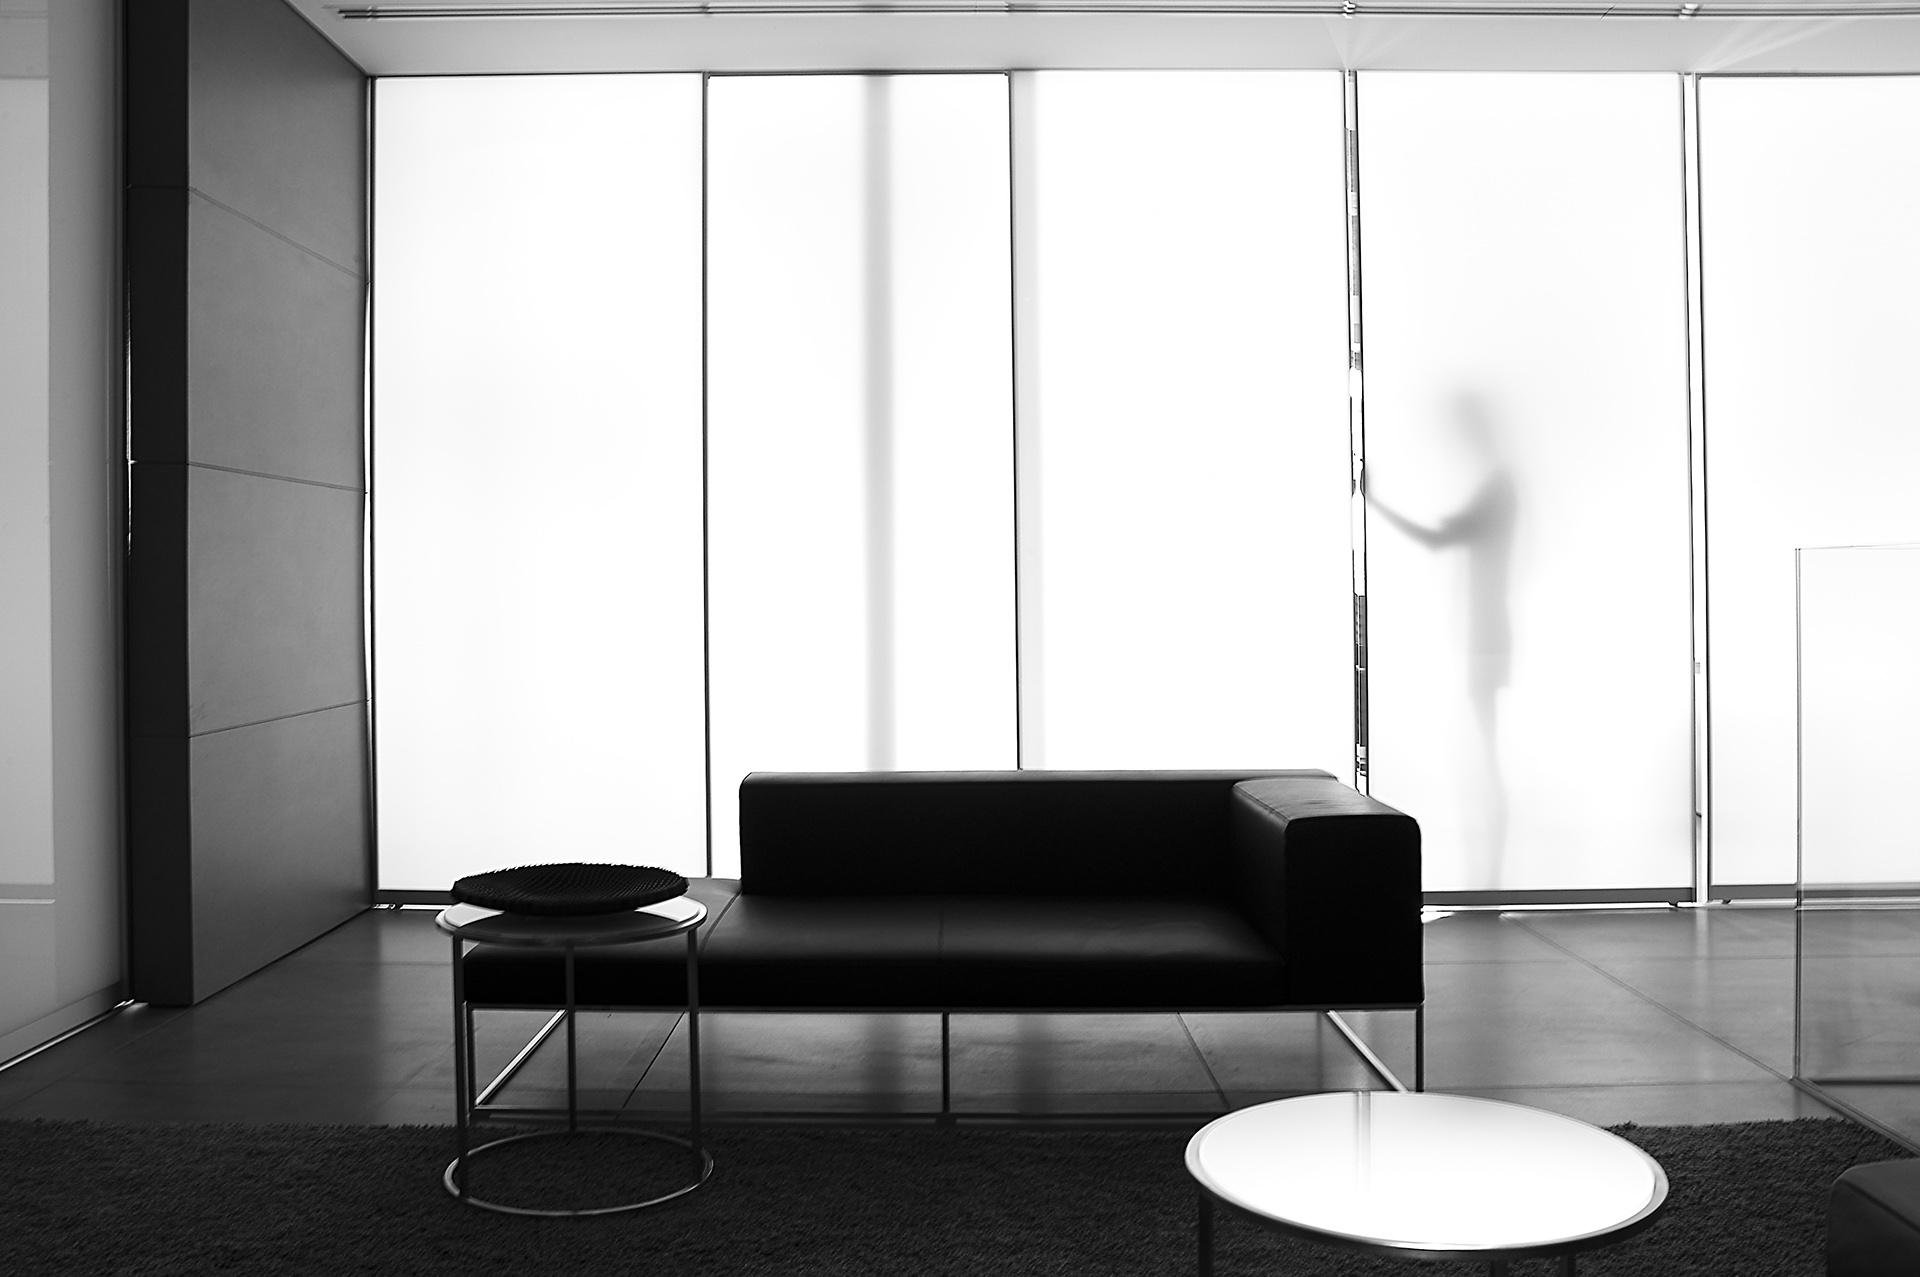 UIA management office |  miami beach | robert wennett